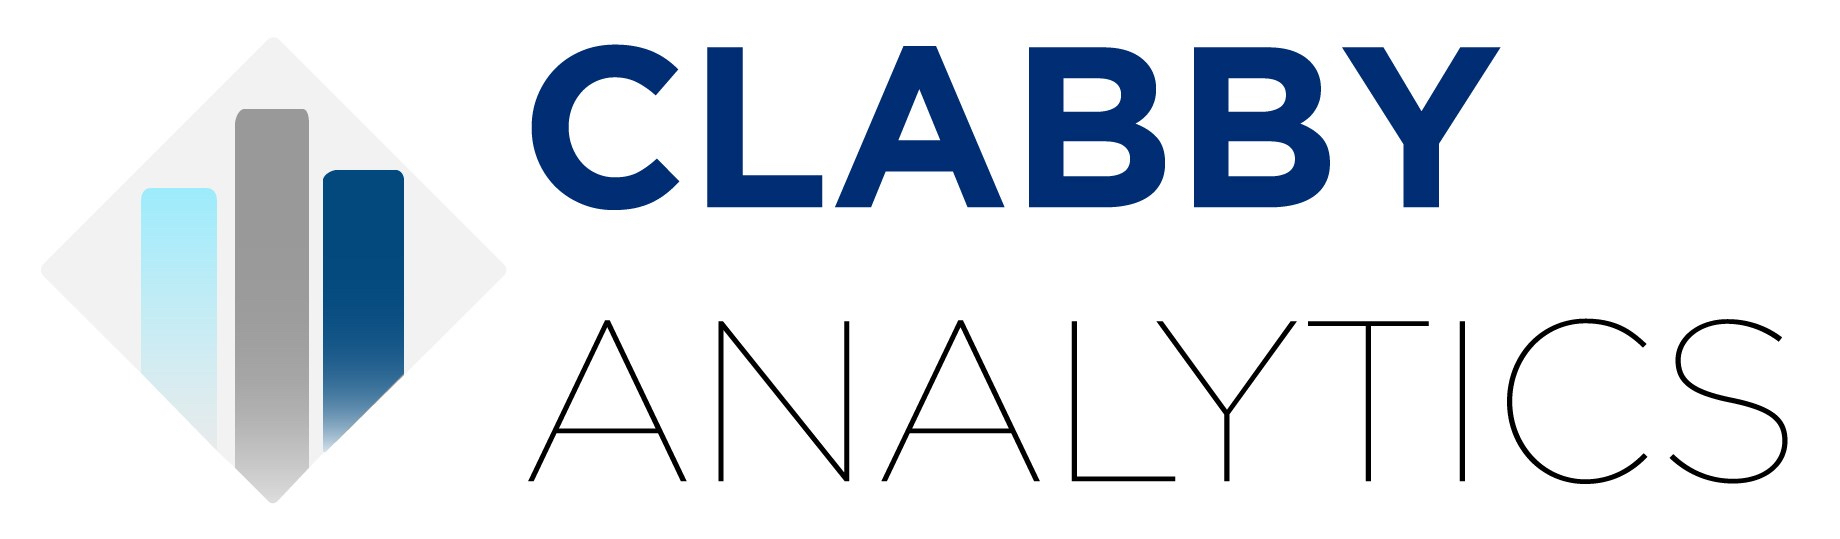 ClabbyAnalytics-Logo_Text-1840x540